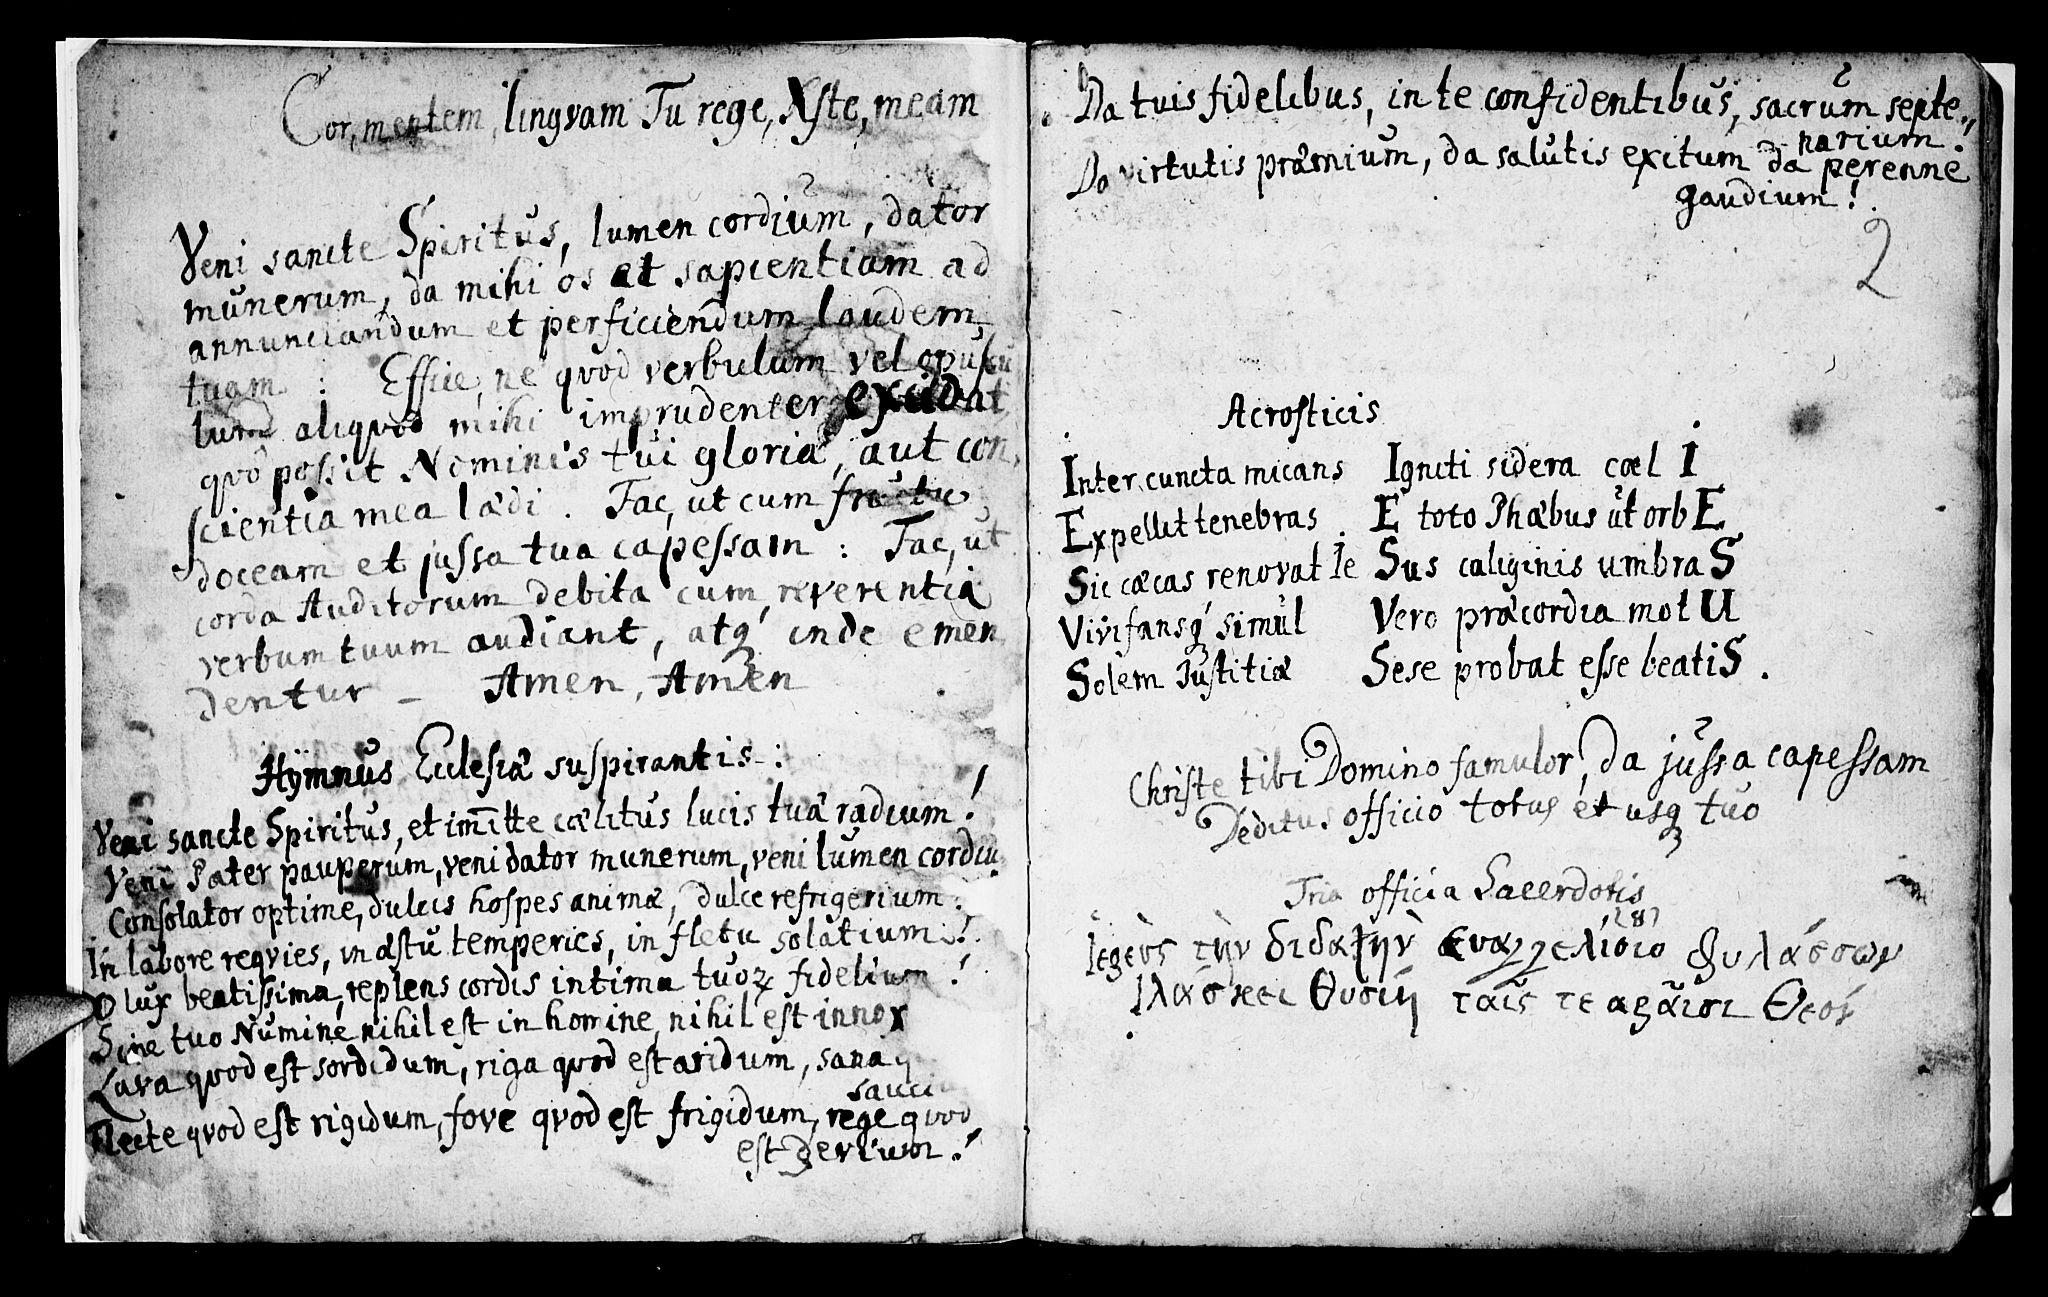 SAB, Leikanger Sokneprestembete, Ministerialbok nr. A 2, 1735-1756, s. 2